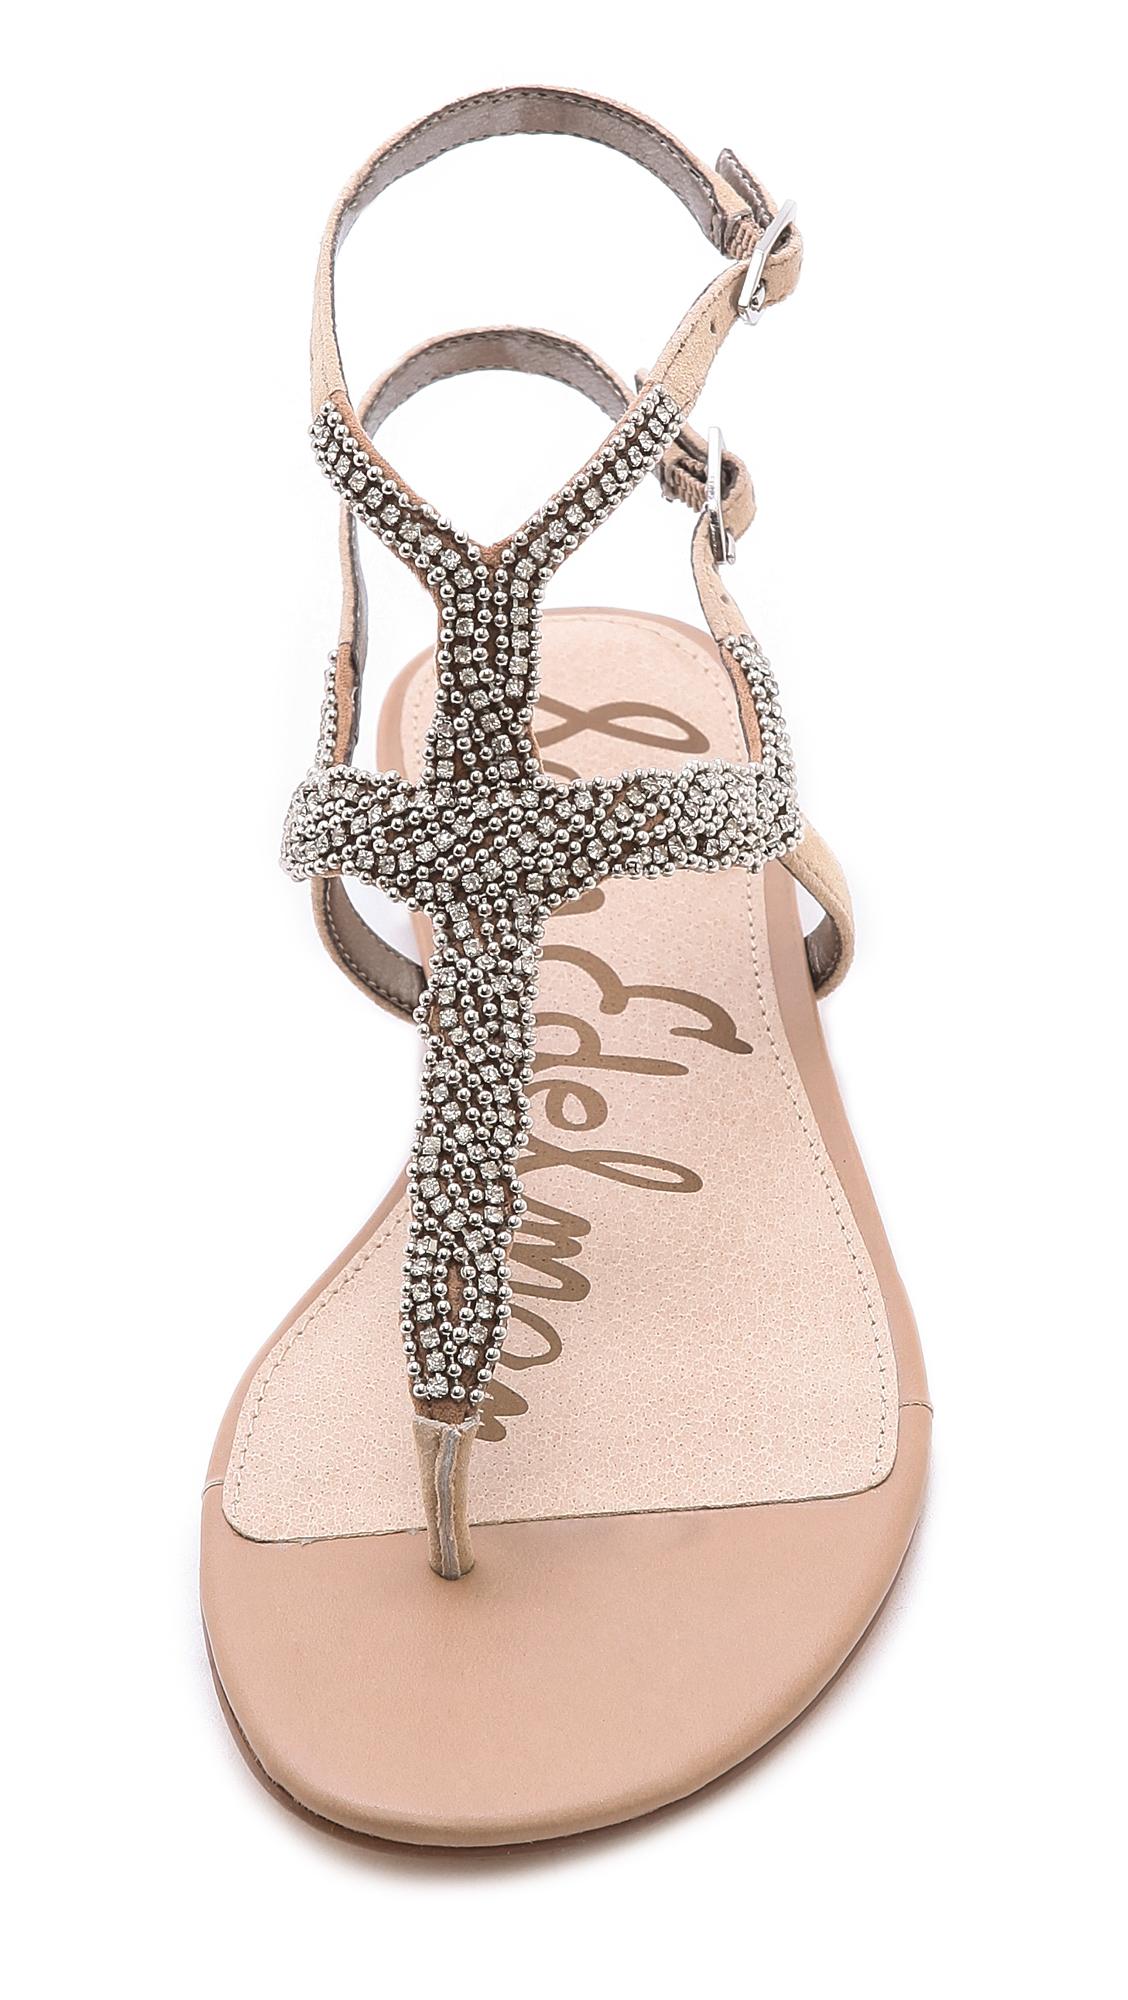 Nahara Buff Sam Nude Jeweled Sandals Edelman Brown eD2bH9IWEY